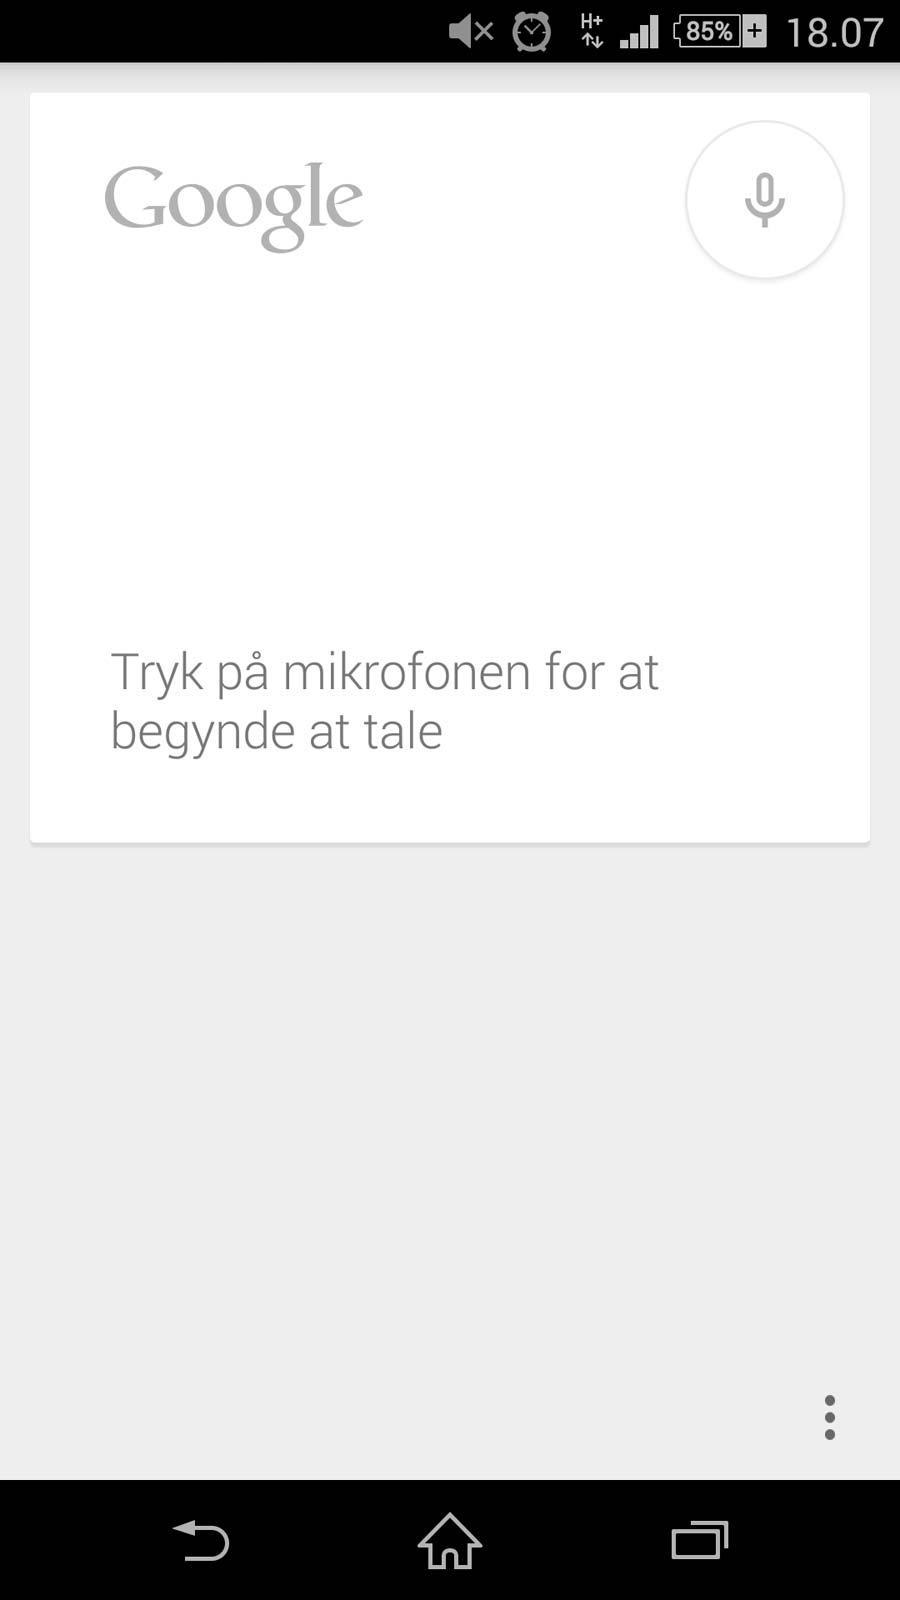 dansk-sprog-google-now